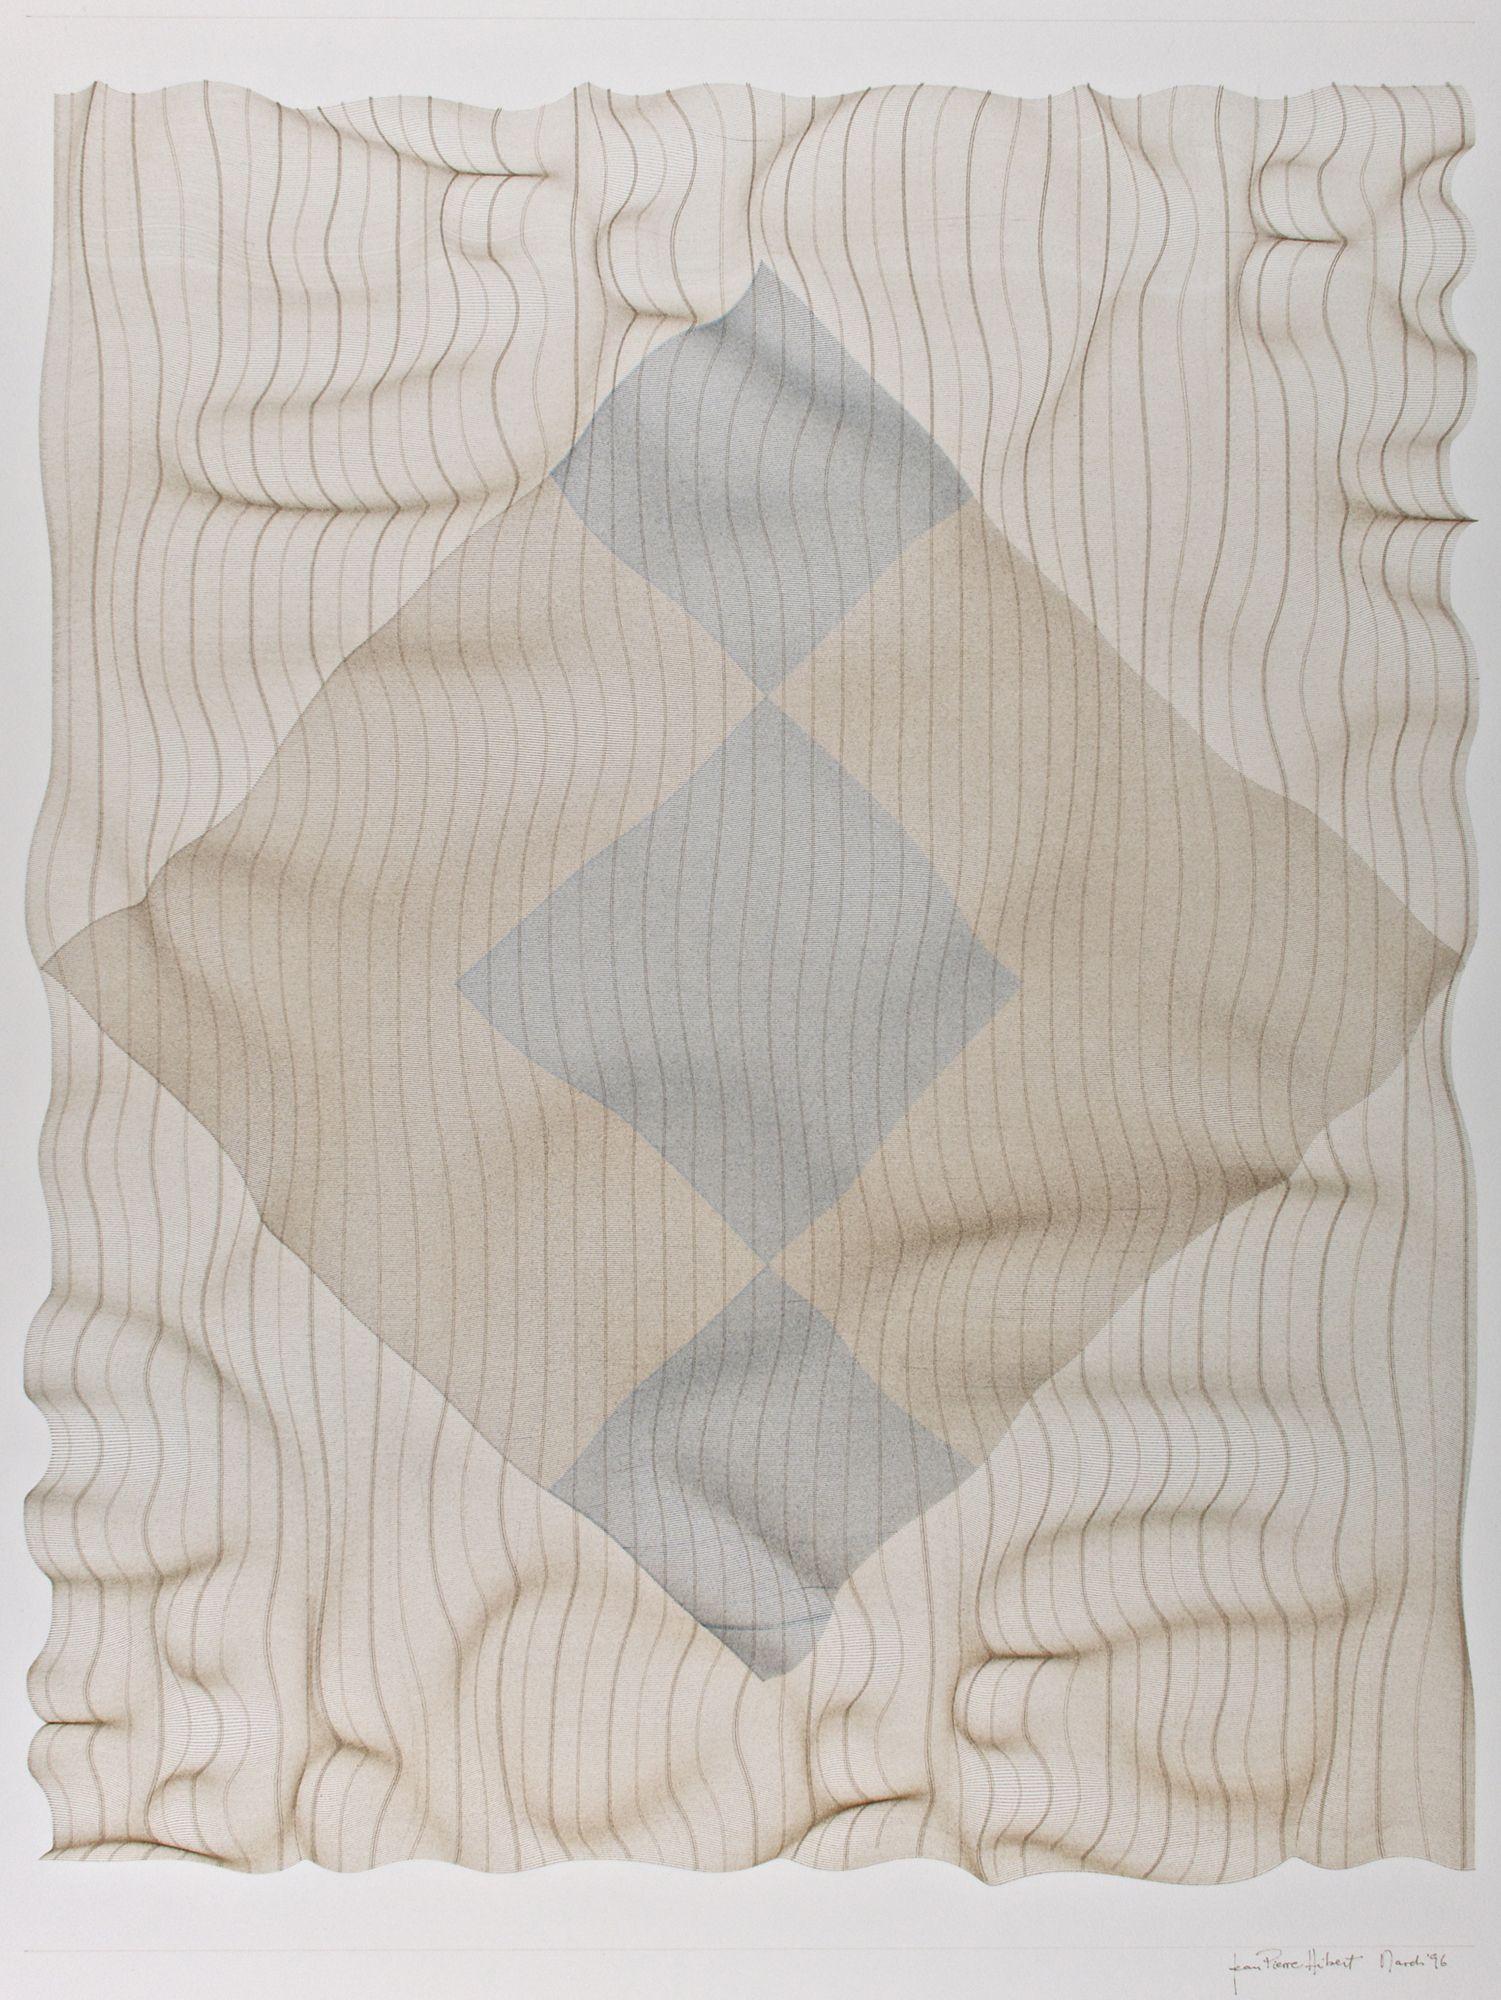 Jean-Pierre Hébert, Warped Grids for Agnes, Plotterzeichnung, Tinte auf Arches Aquarellpapier off-white, 73,5 x 55 cm, 1996